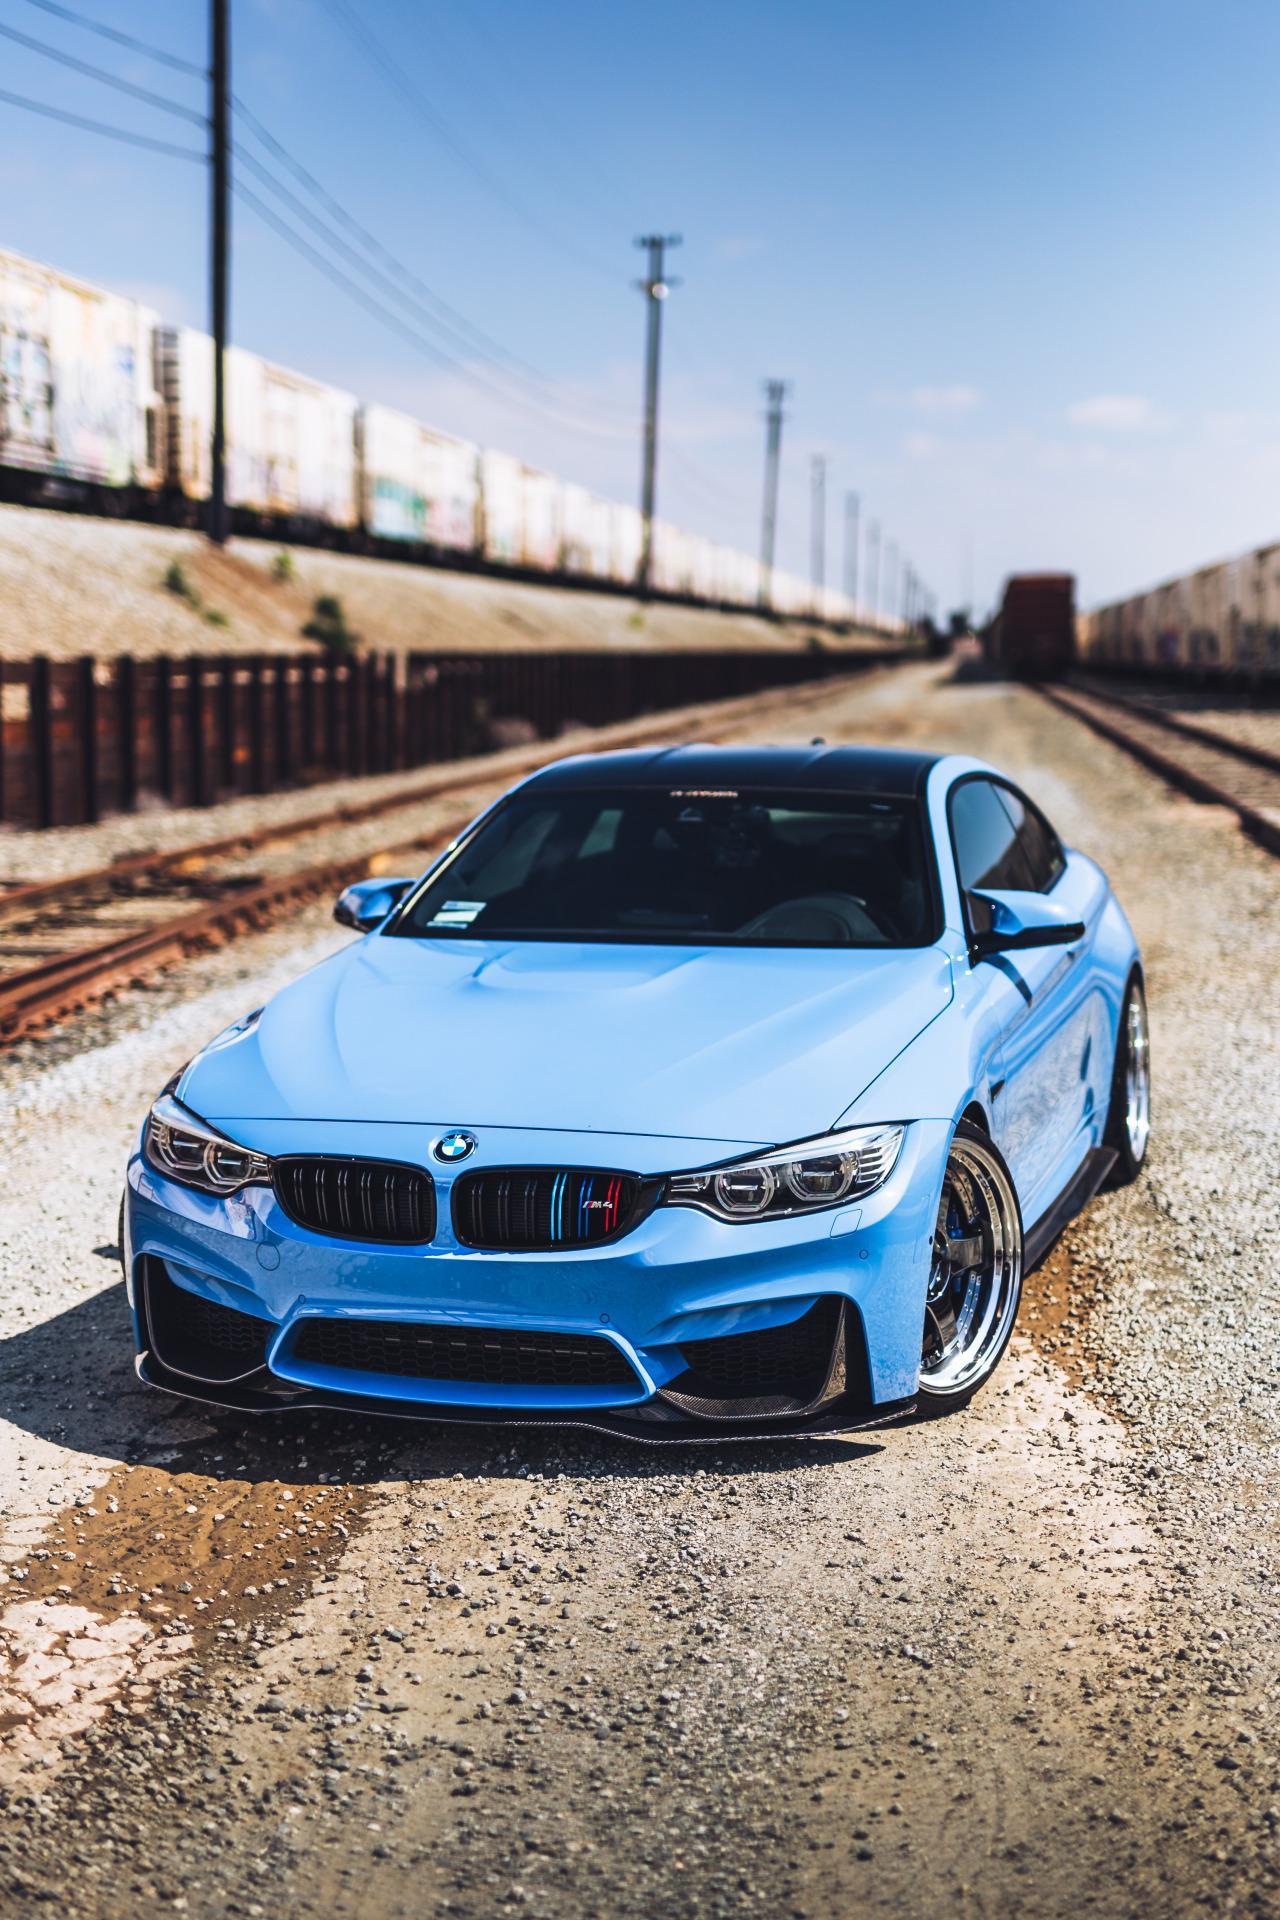 bmw m4 blue urbal sportscar motor auto speed drive